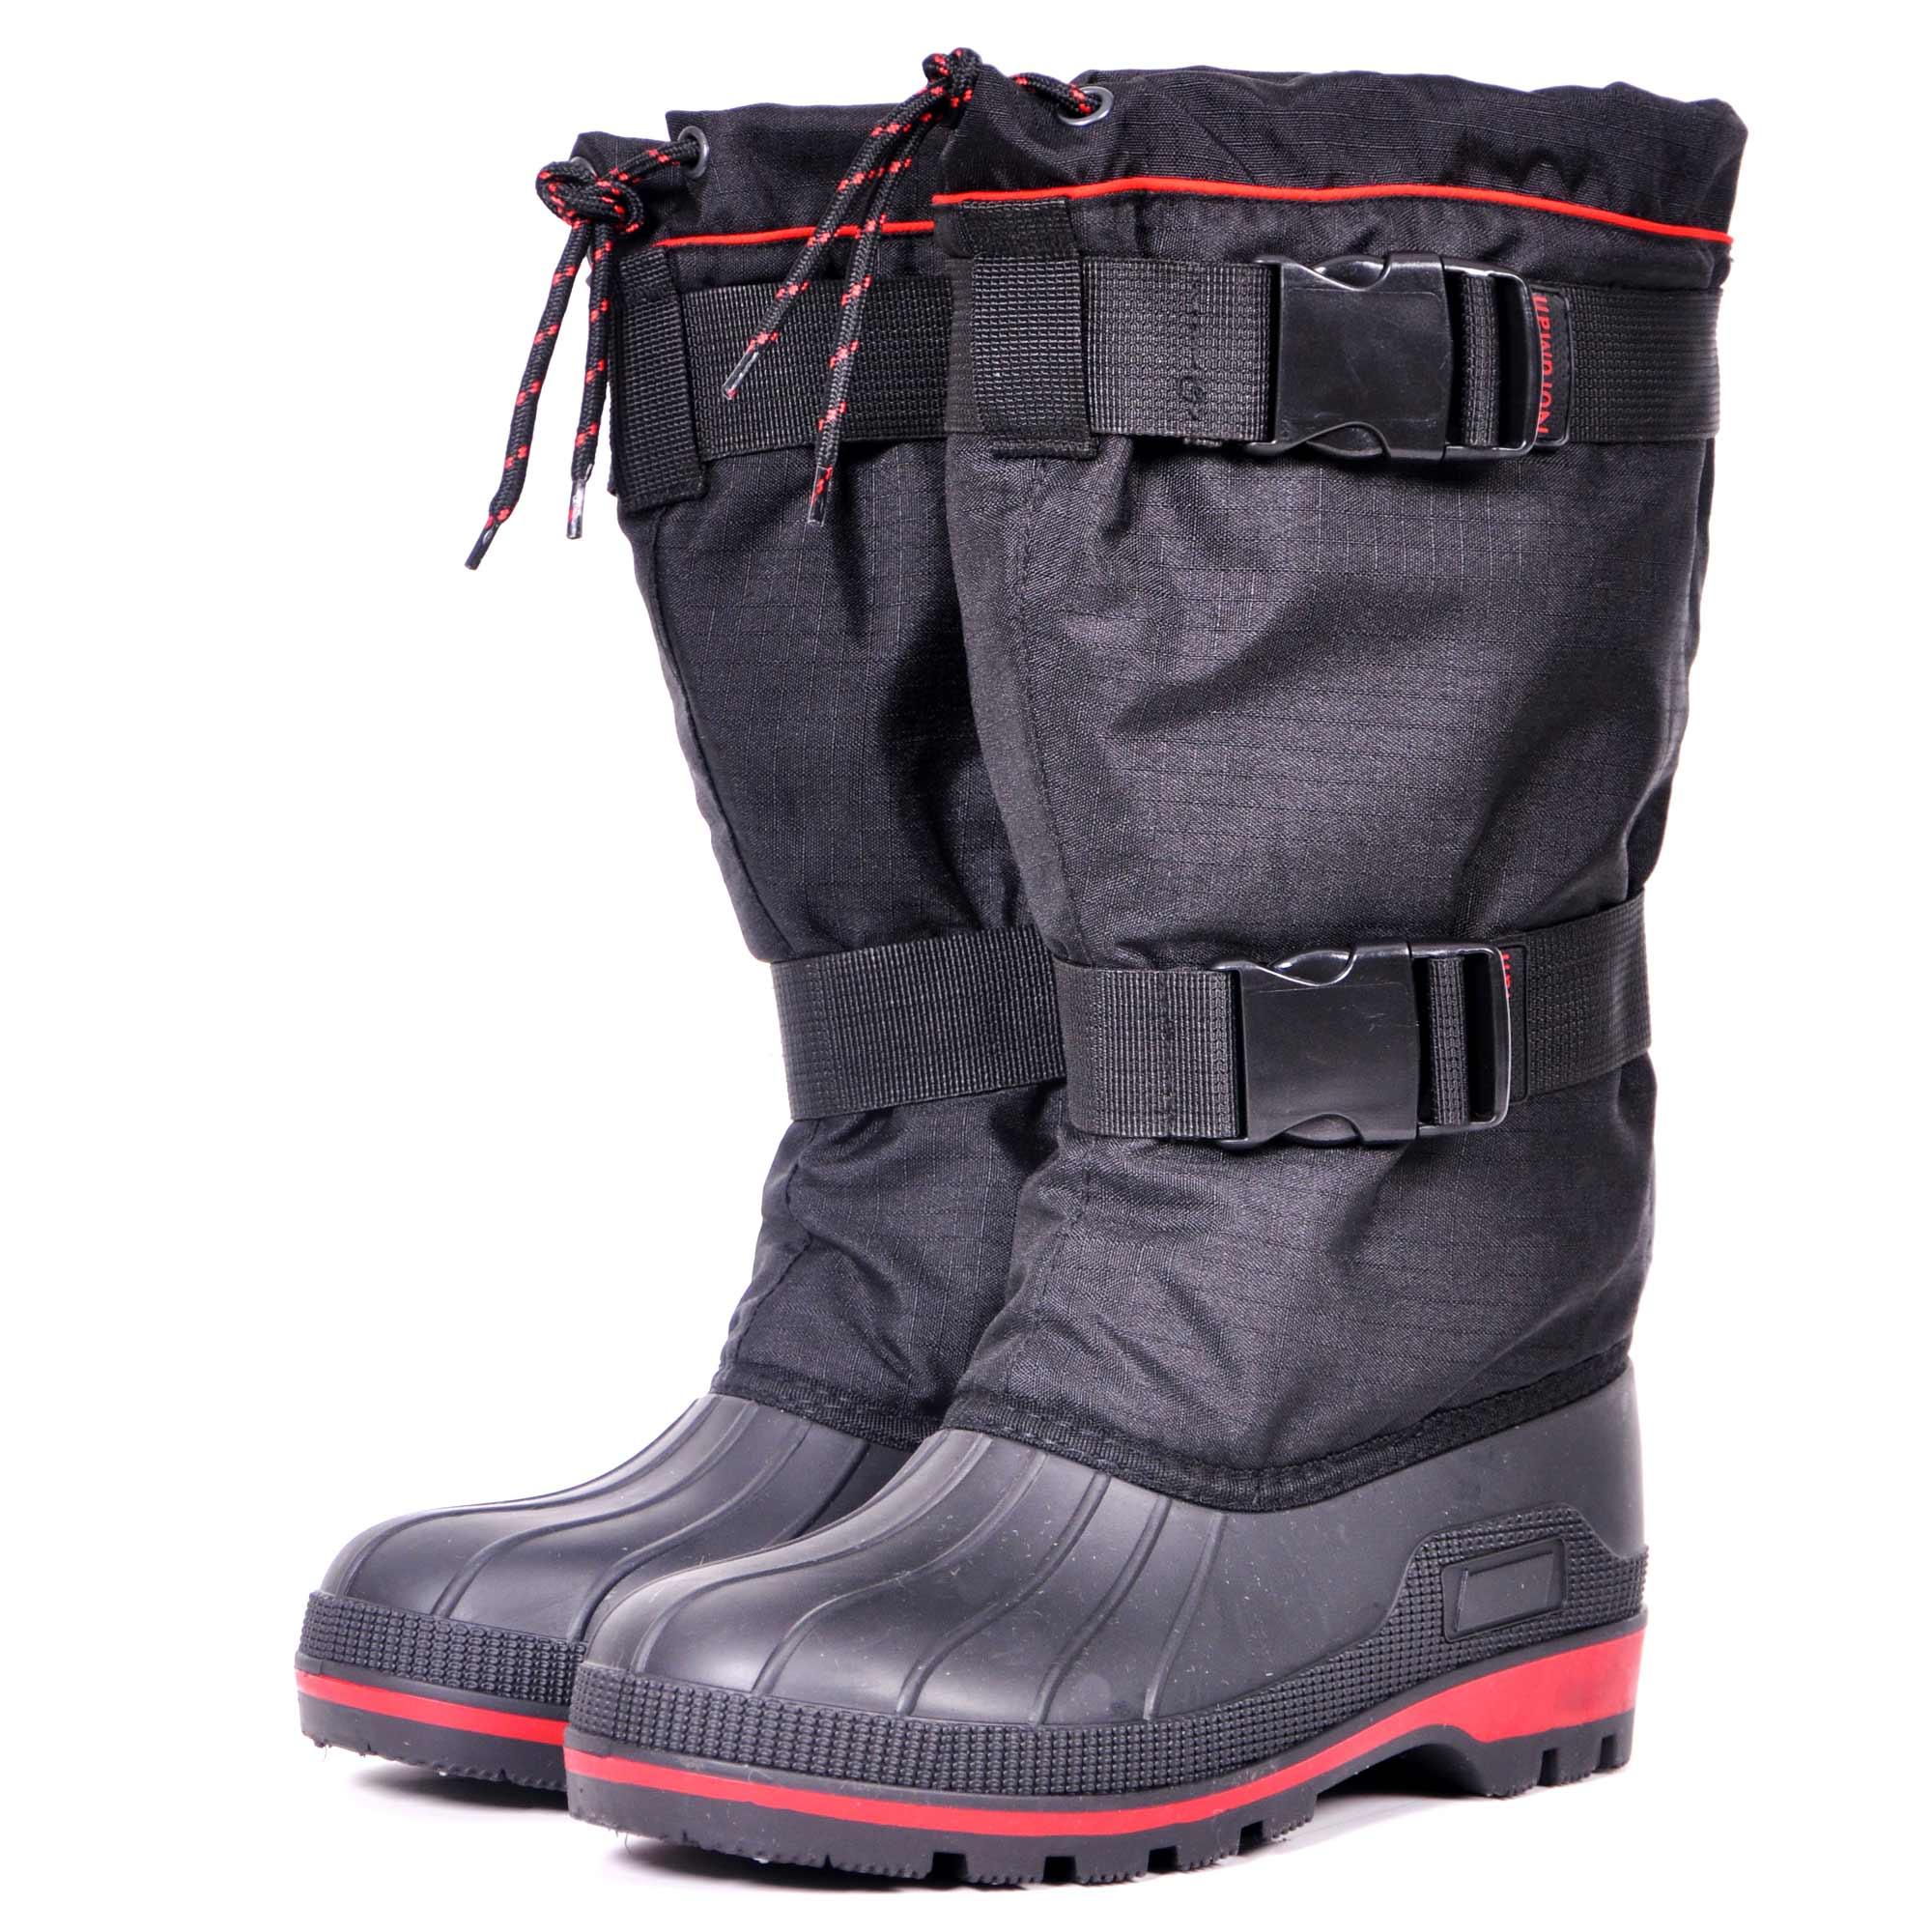 Бахилы для охоты Nordman New Red, на карабинах, черные, 44 RU